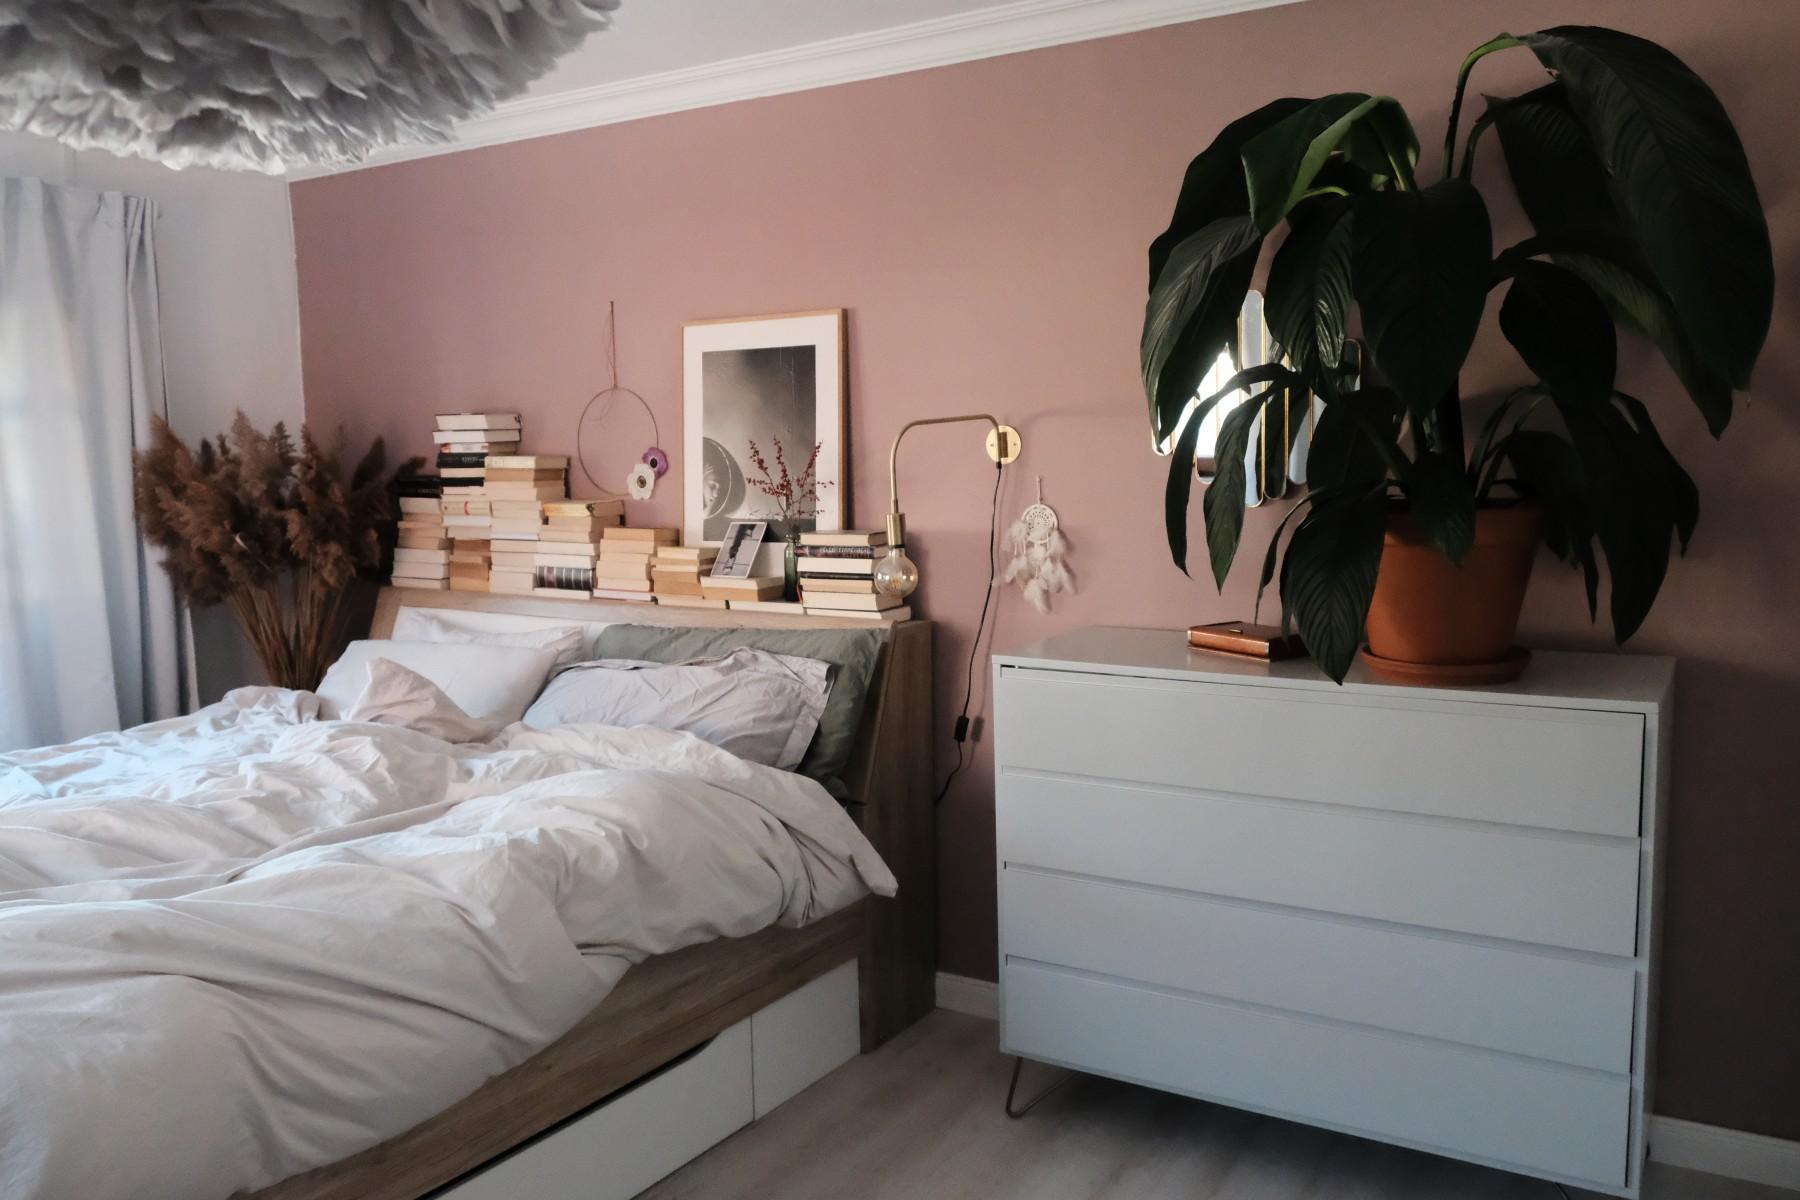 Bett, Modern, Schrank, Pflanze, Weiß